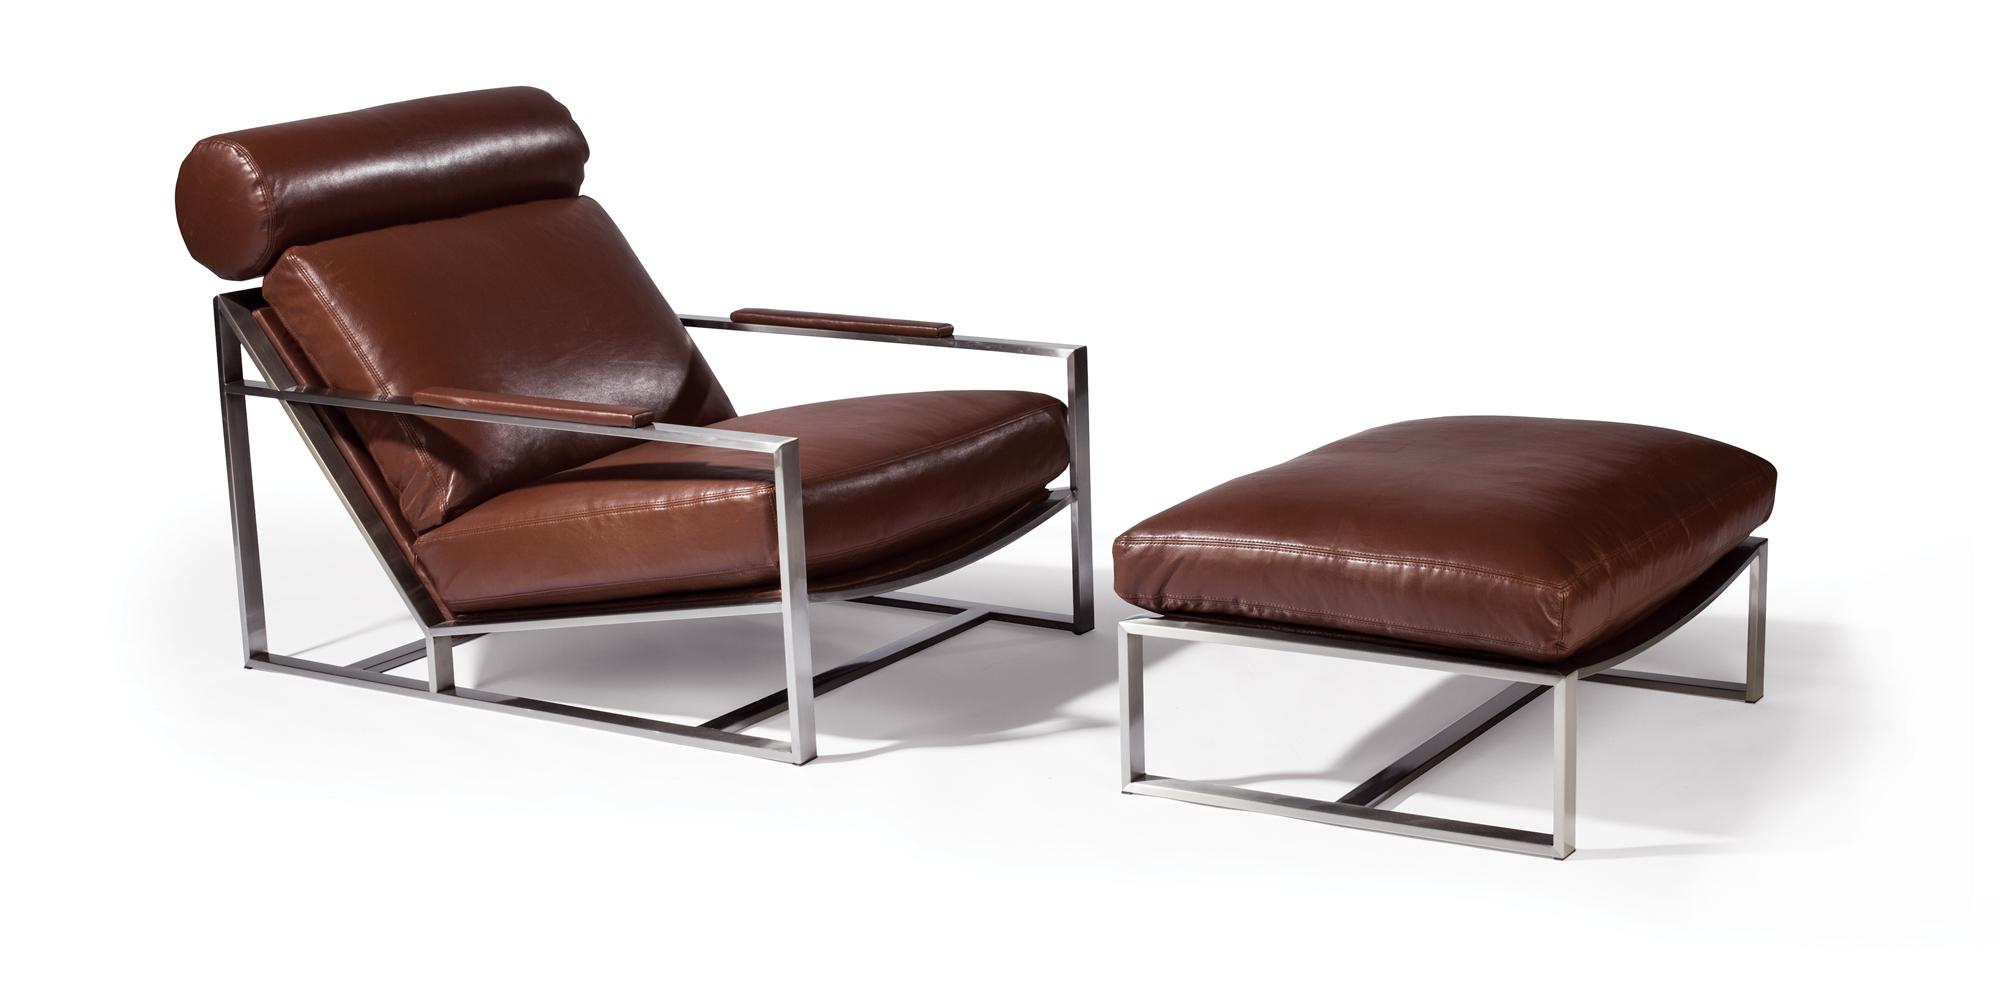 Cruisin' Lounge Chair and Ottoman